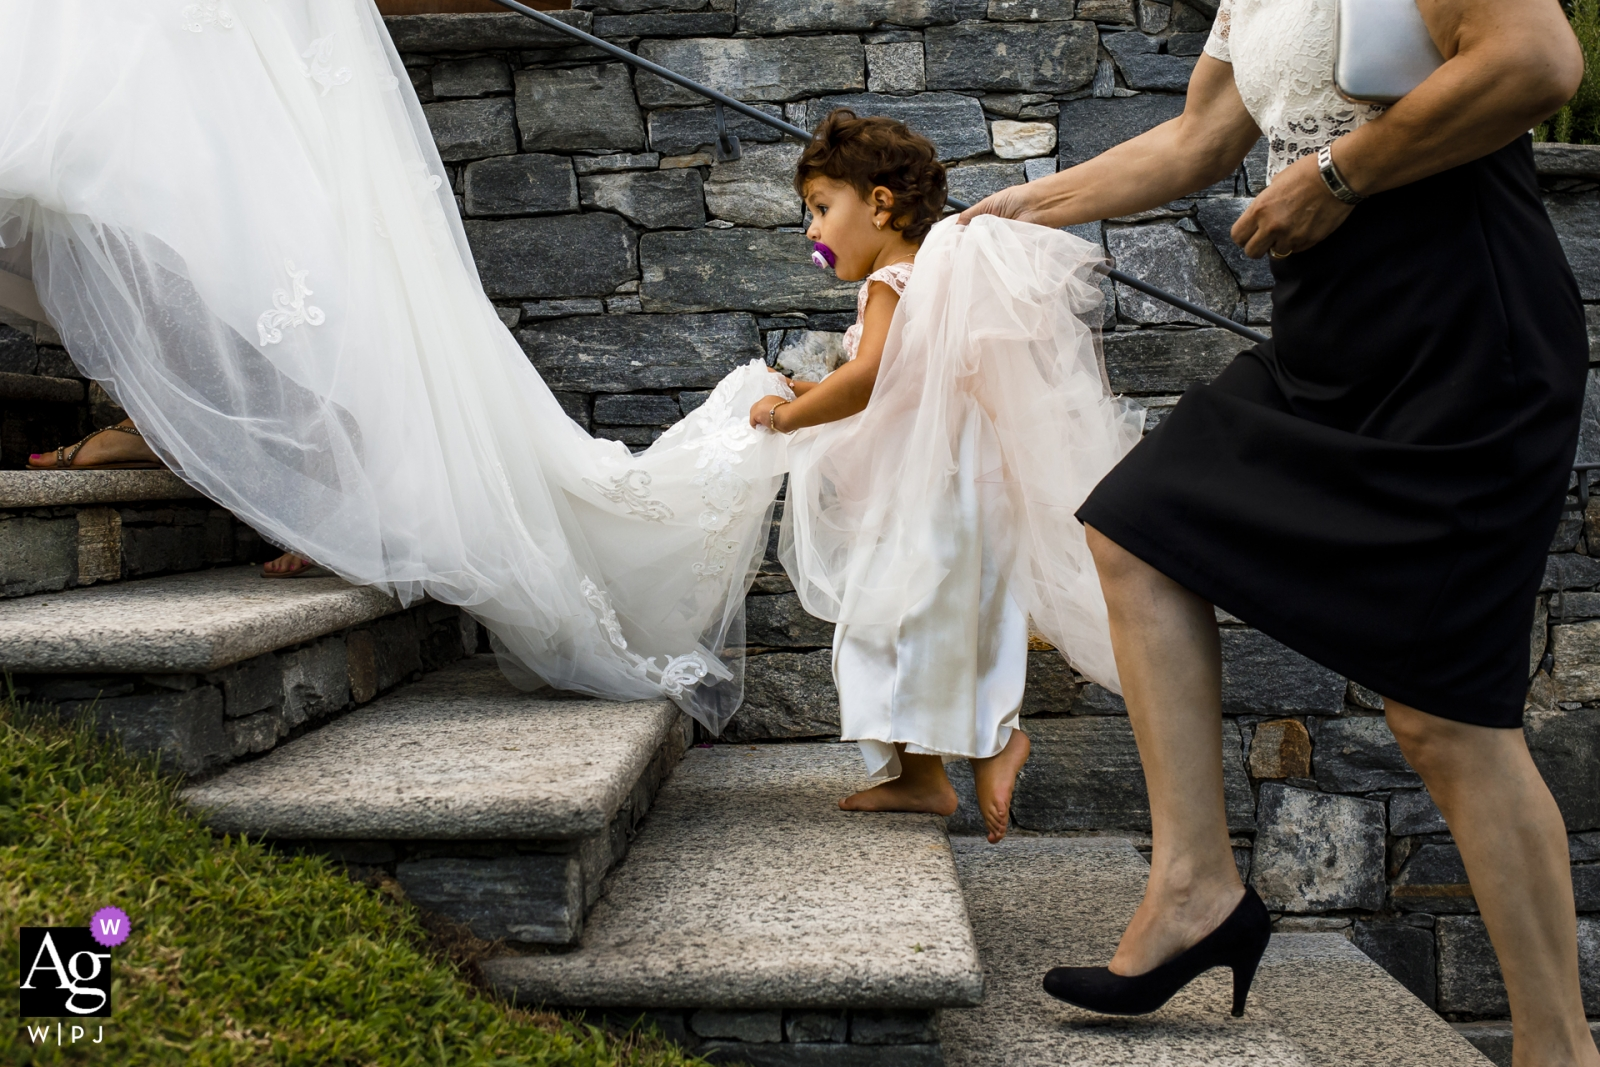 Ufuk Sarisen is an artistic wedding photographer for Istanbul